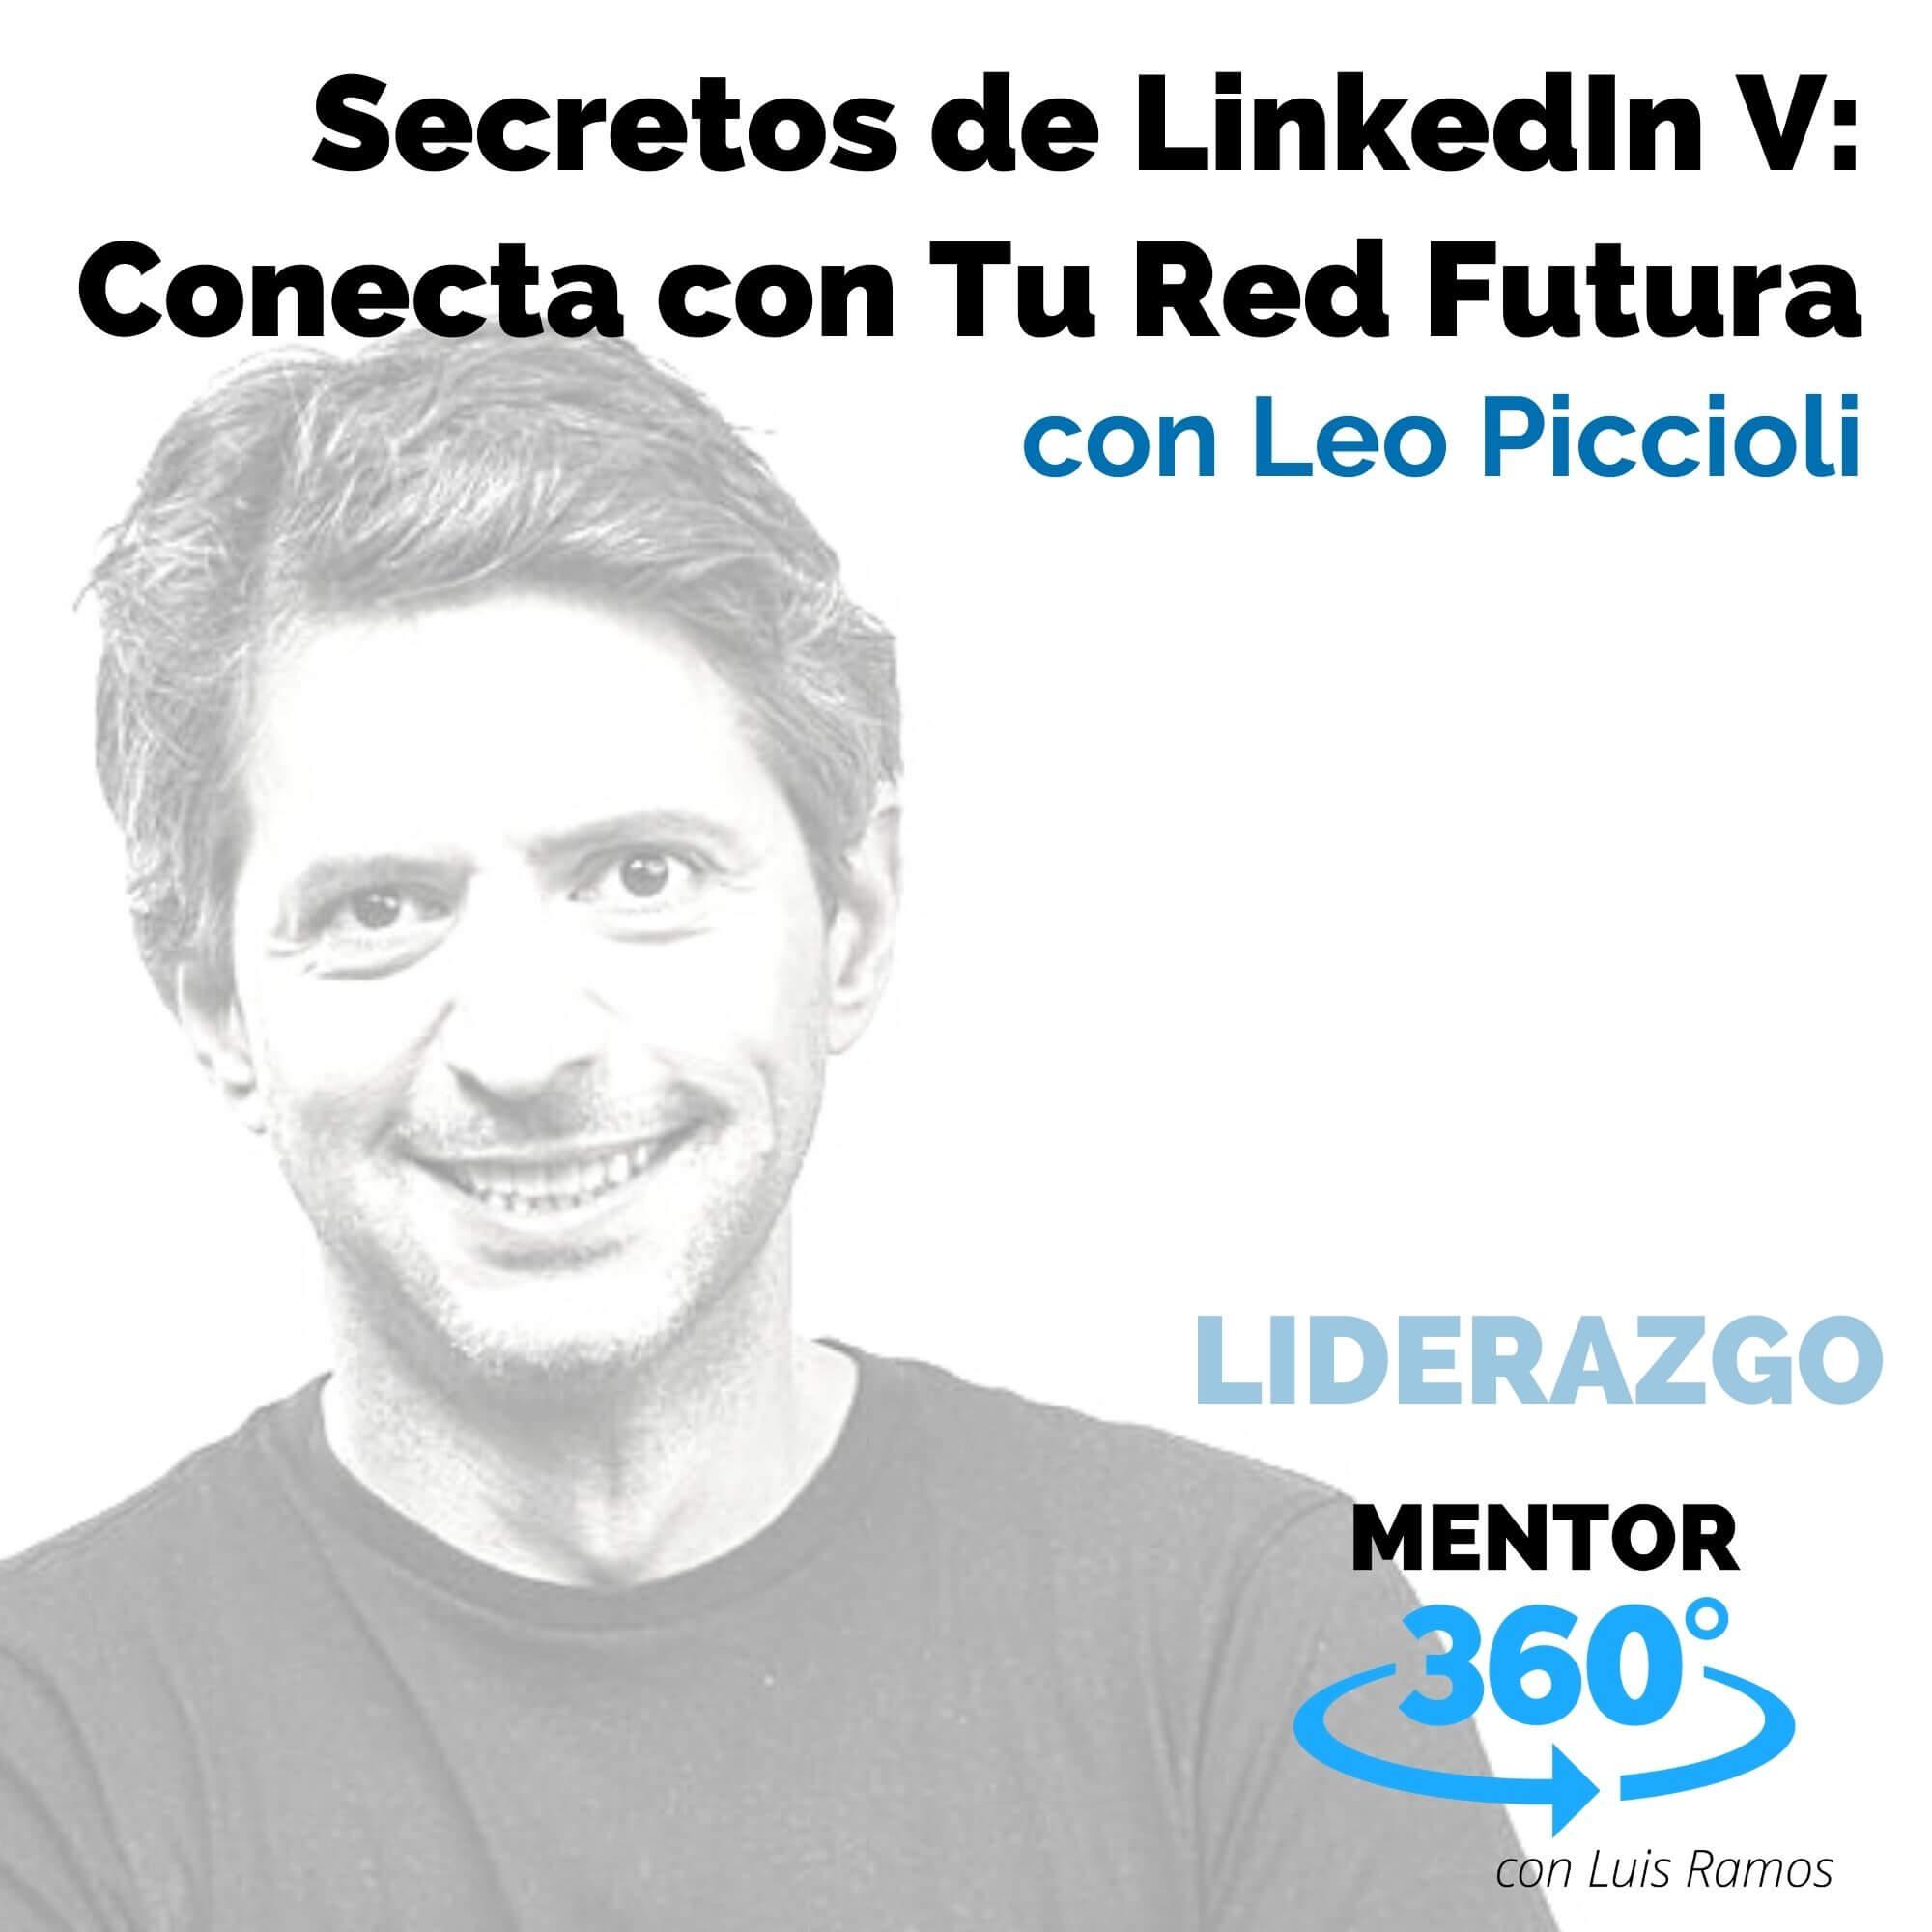 Secretos de LinkedIn 5 - Conecta con Tu Red del Futuro, con Leo Piccioli - MENTOR360